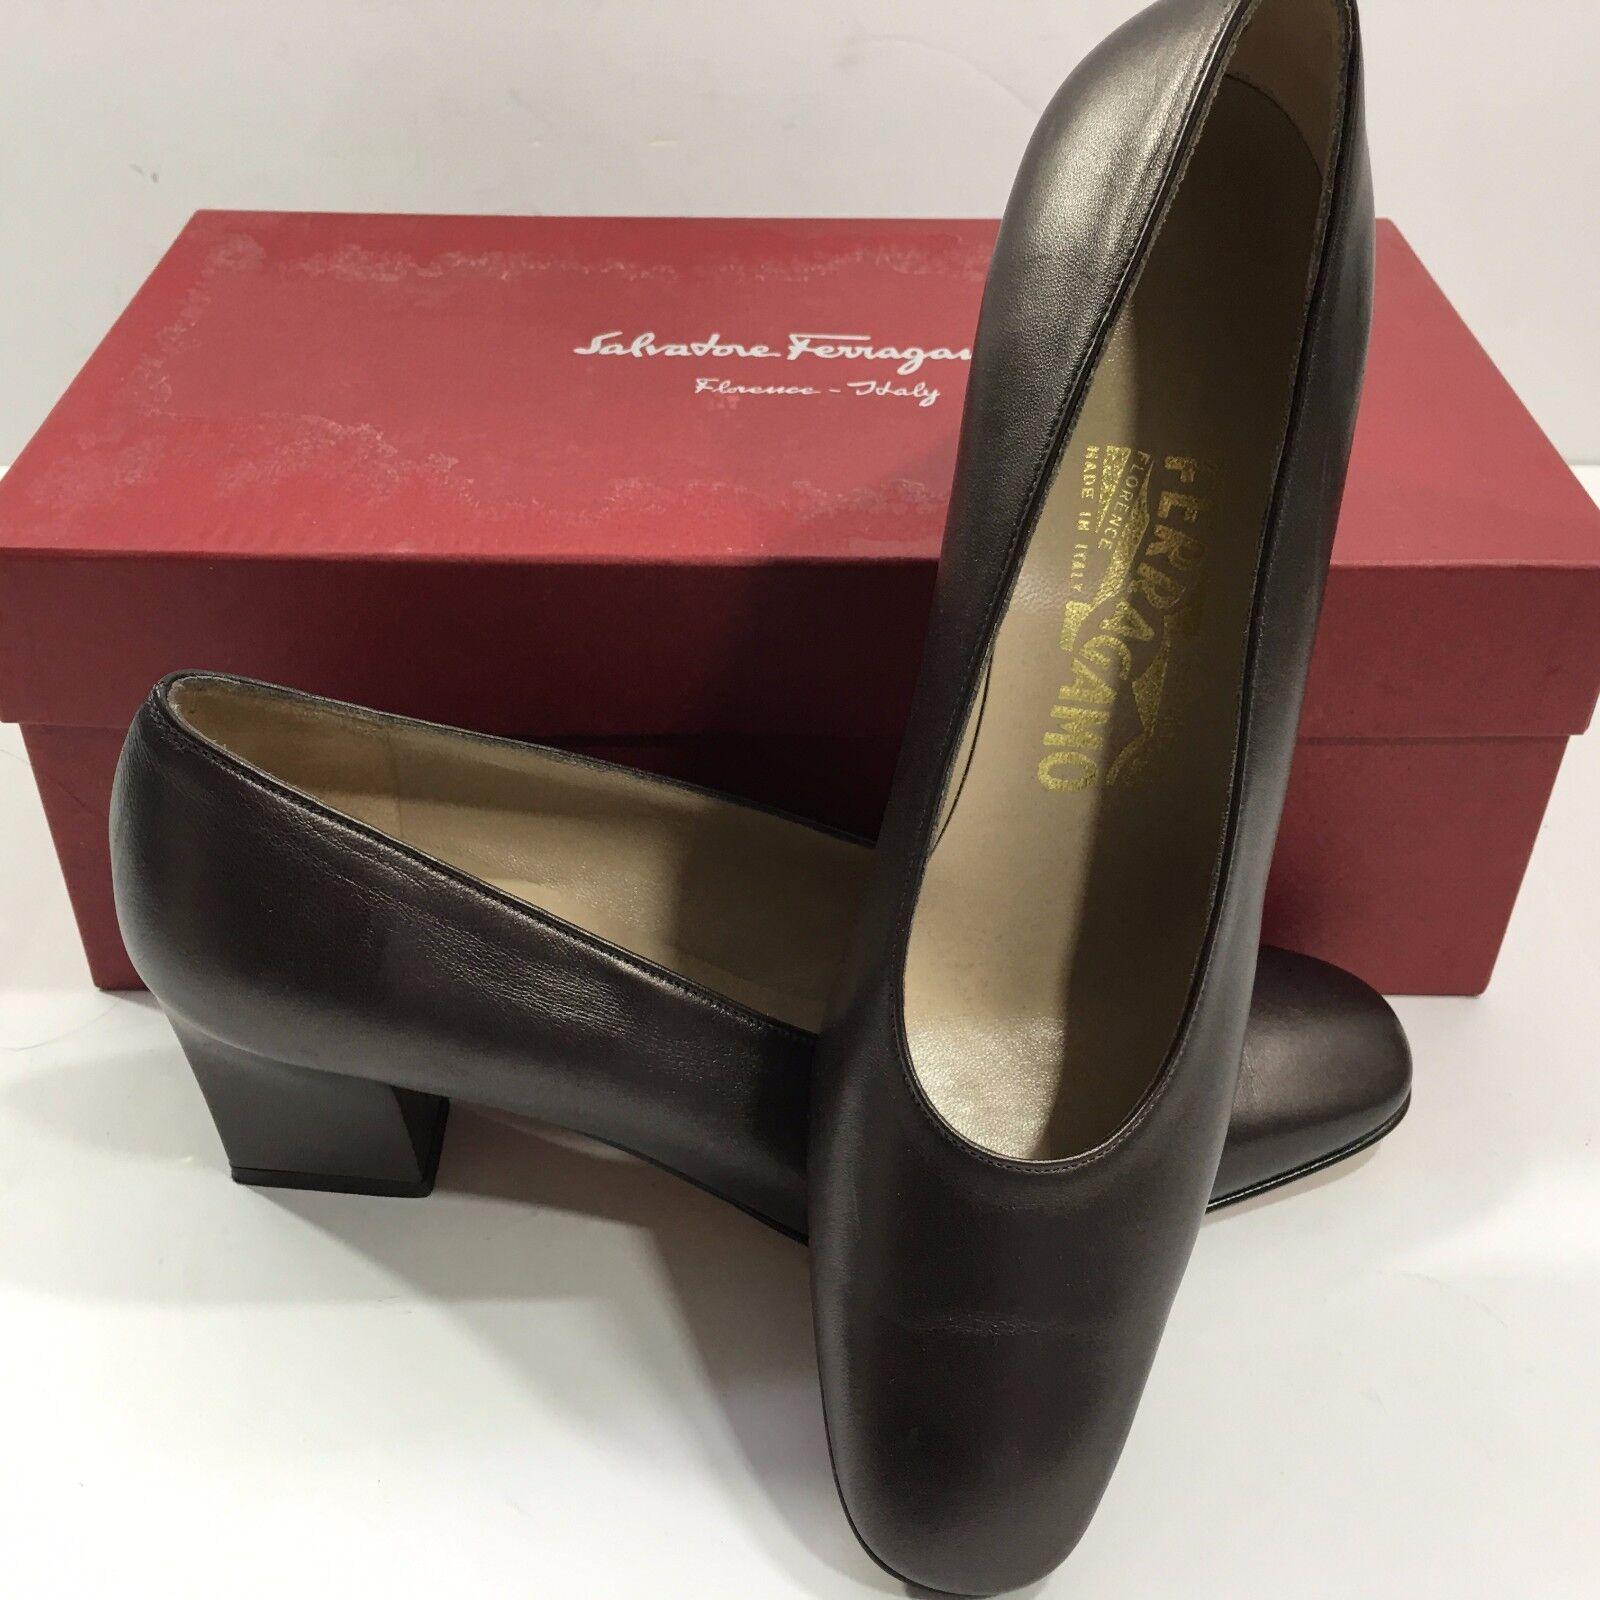 Salvatore Ferragamo 1/2) Women's Med Heel Dress Shoes (Brown, 7 1/2) Ferragamo 777d6a